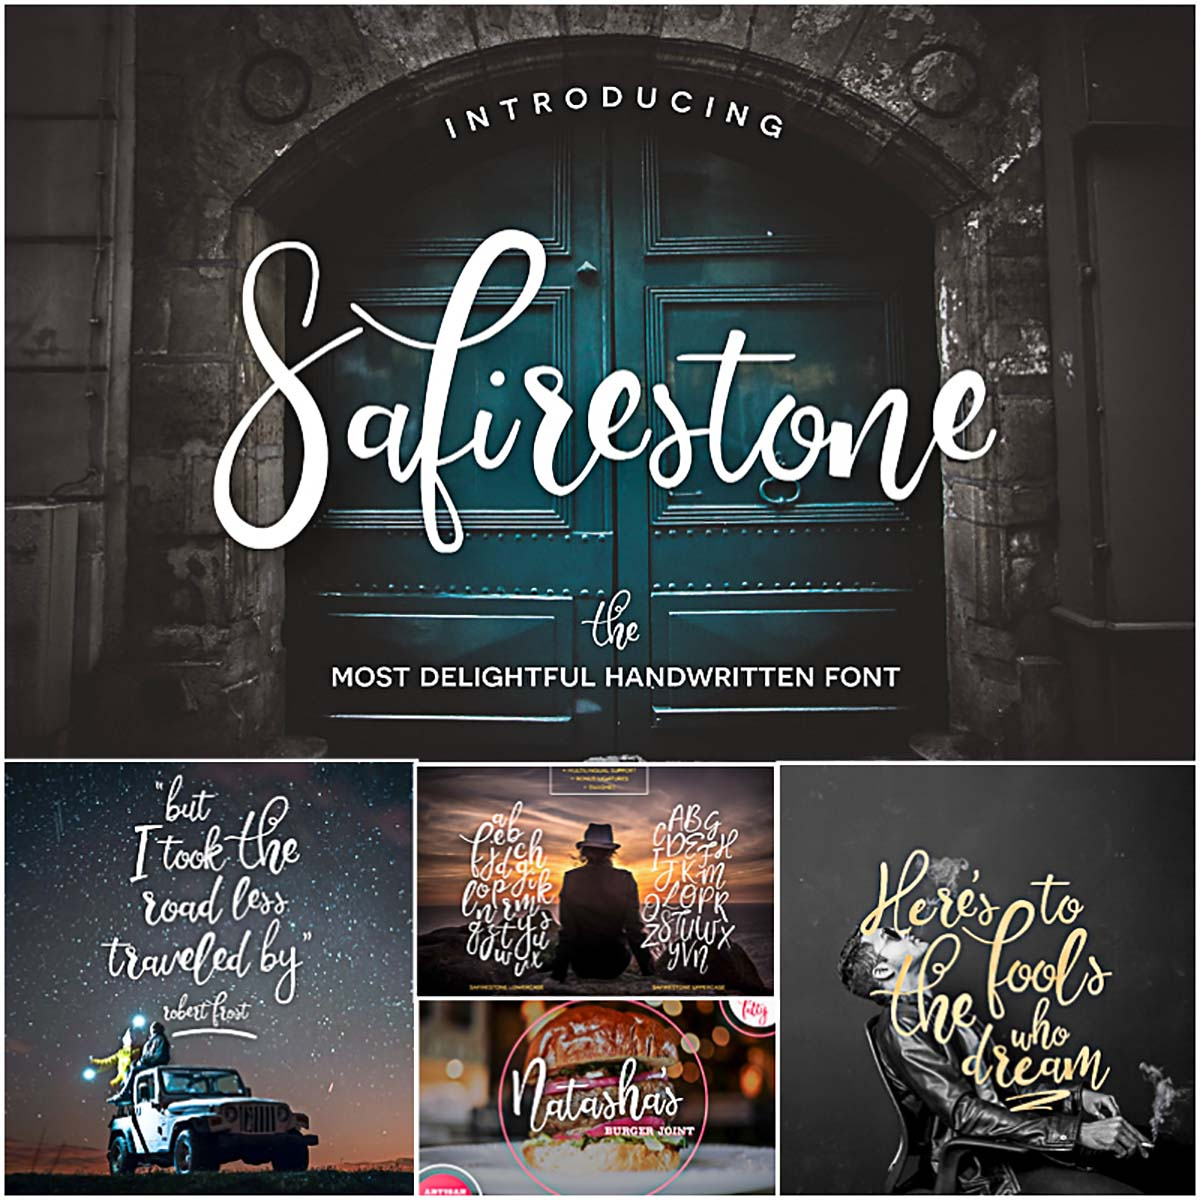 Safirestone calligraphy font